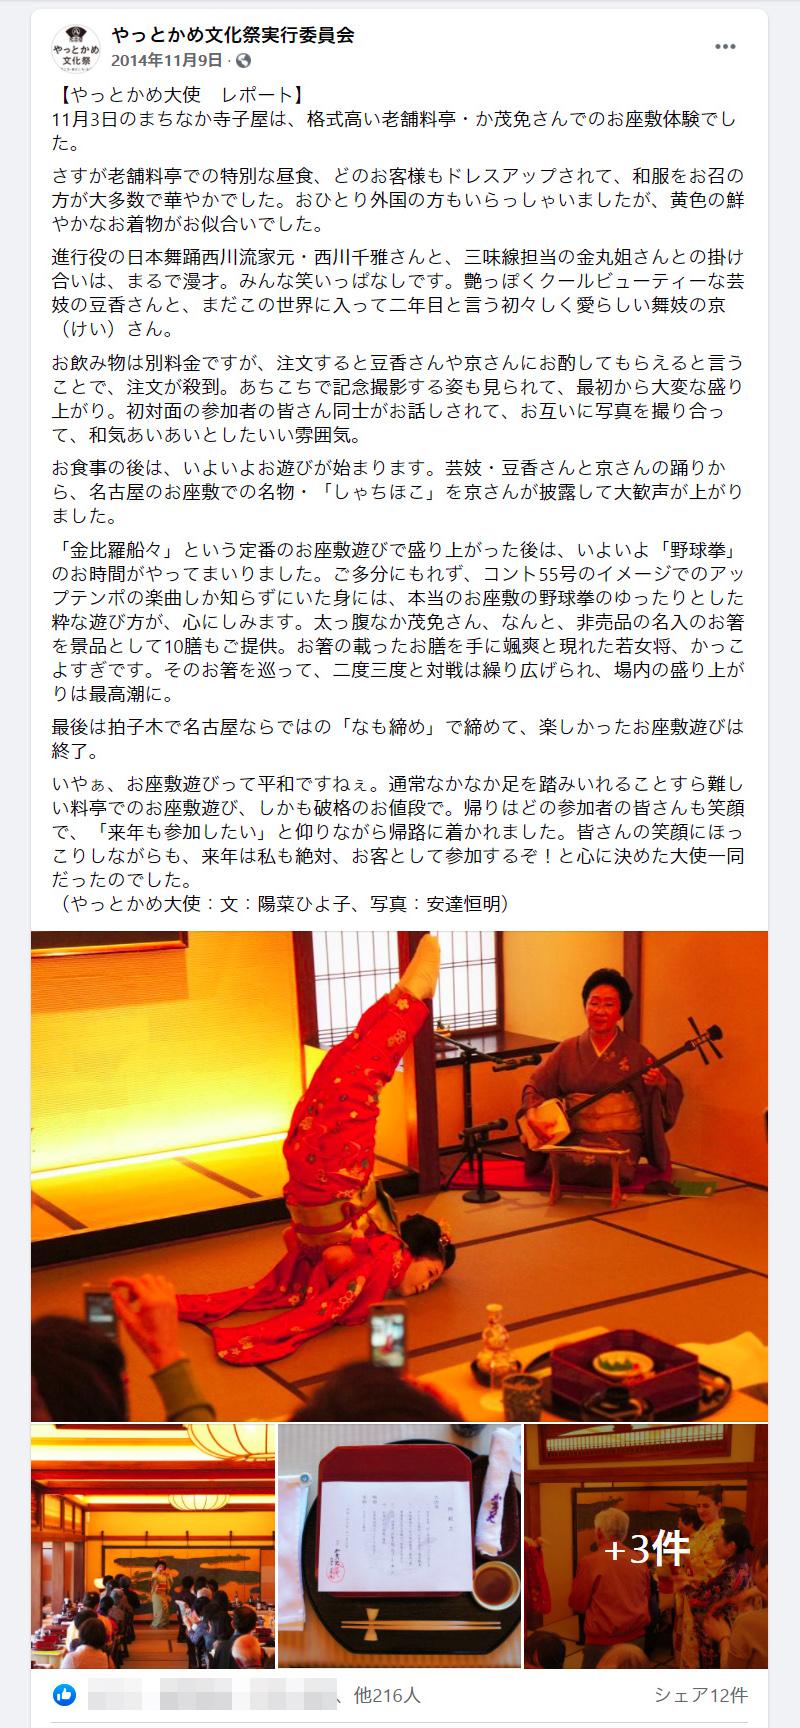 141103ozashiki_report01.jpg